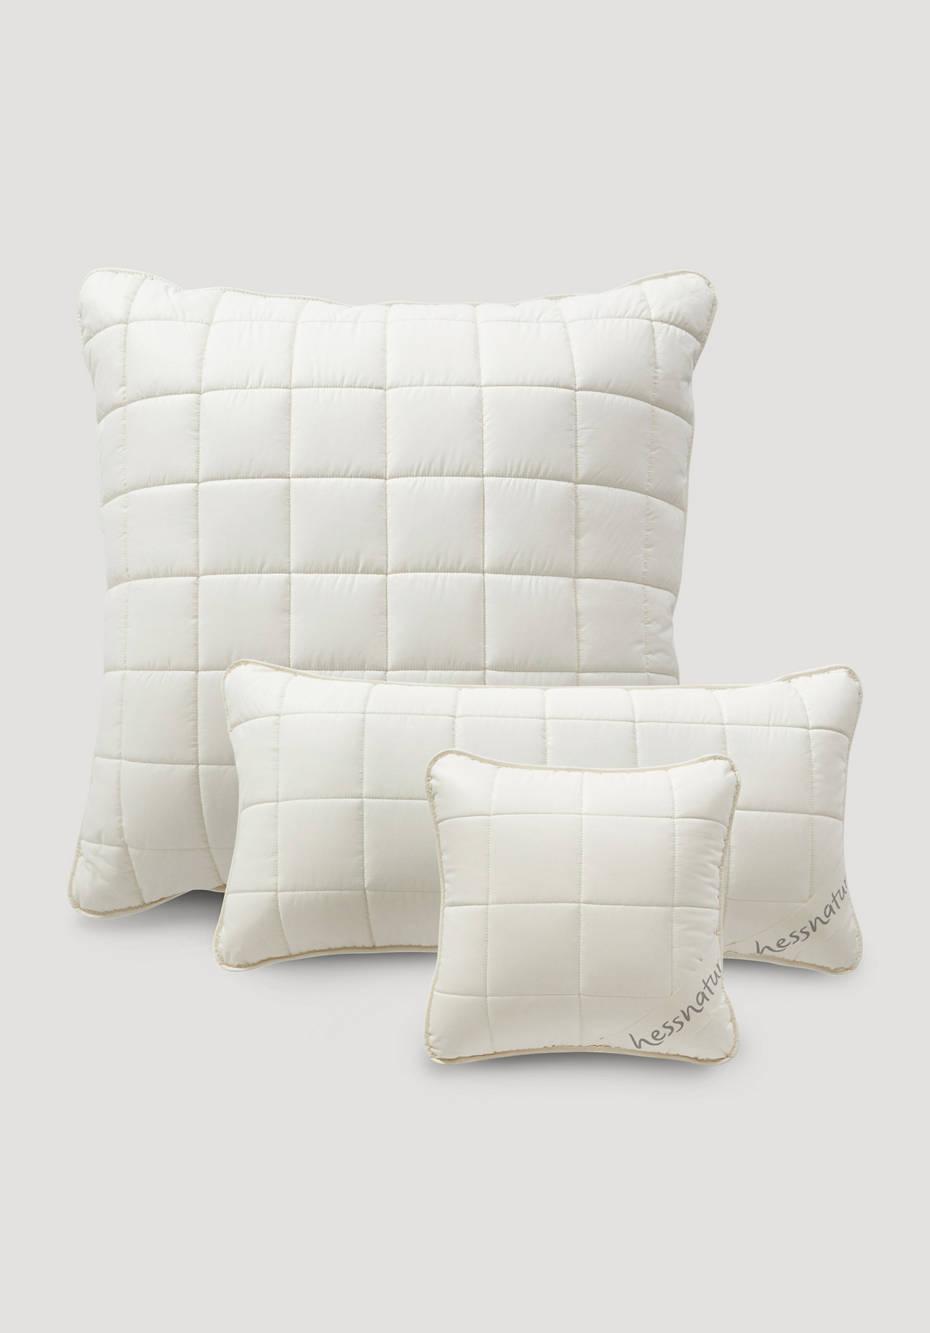 Pillow with kapok and organic cotton